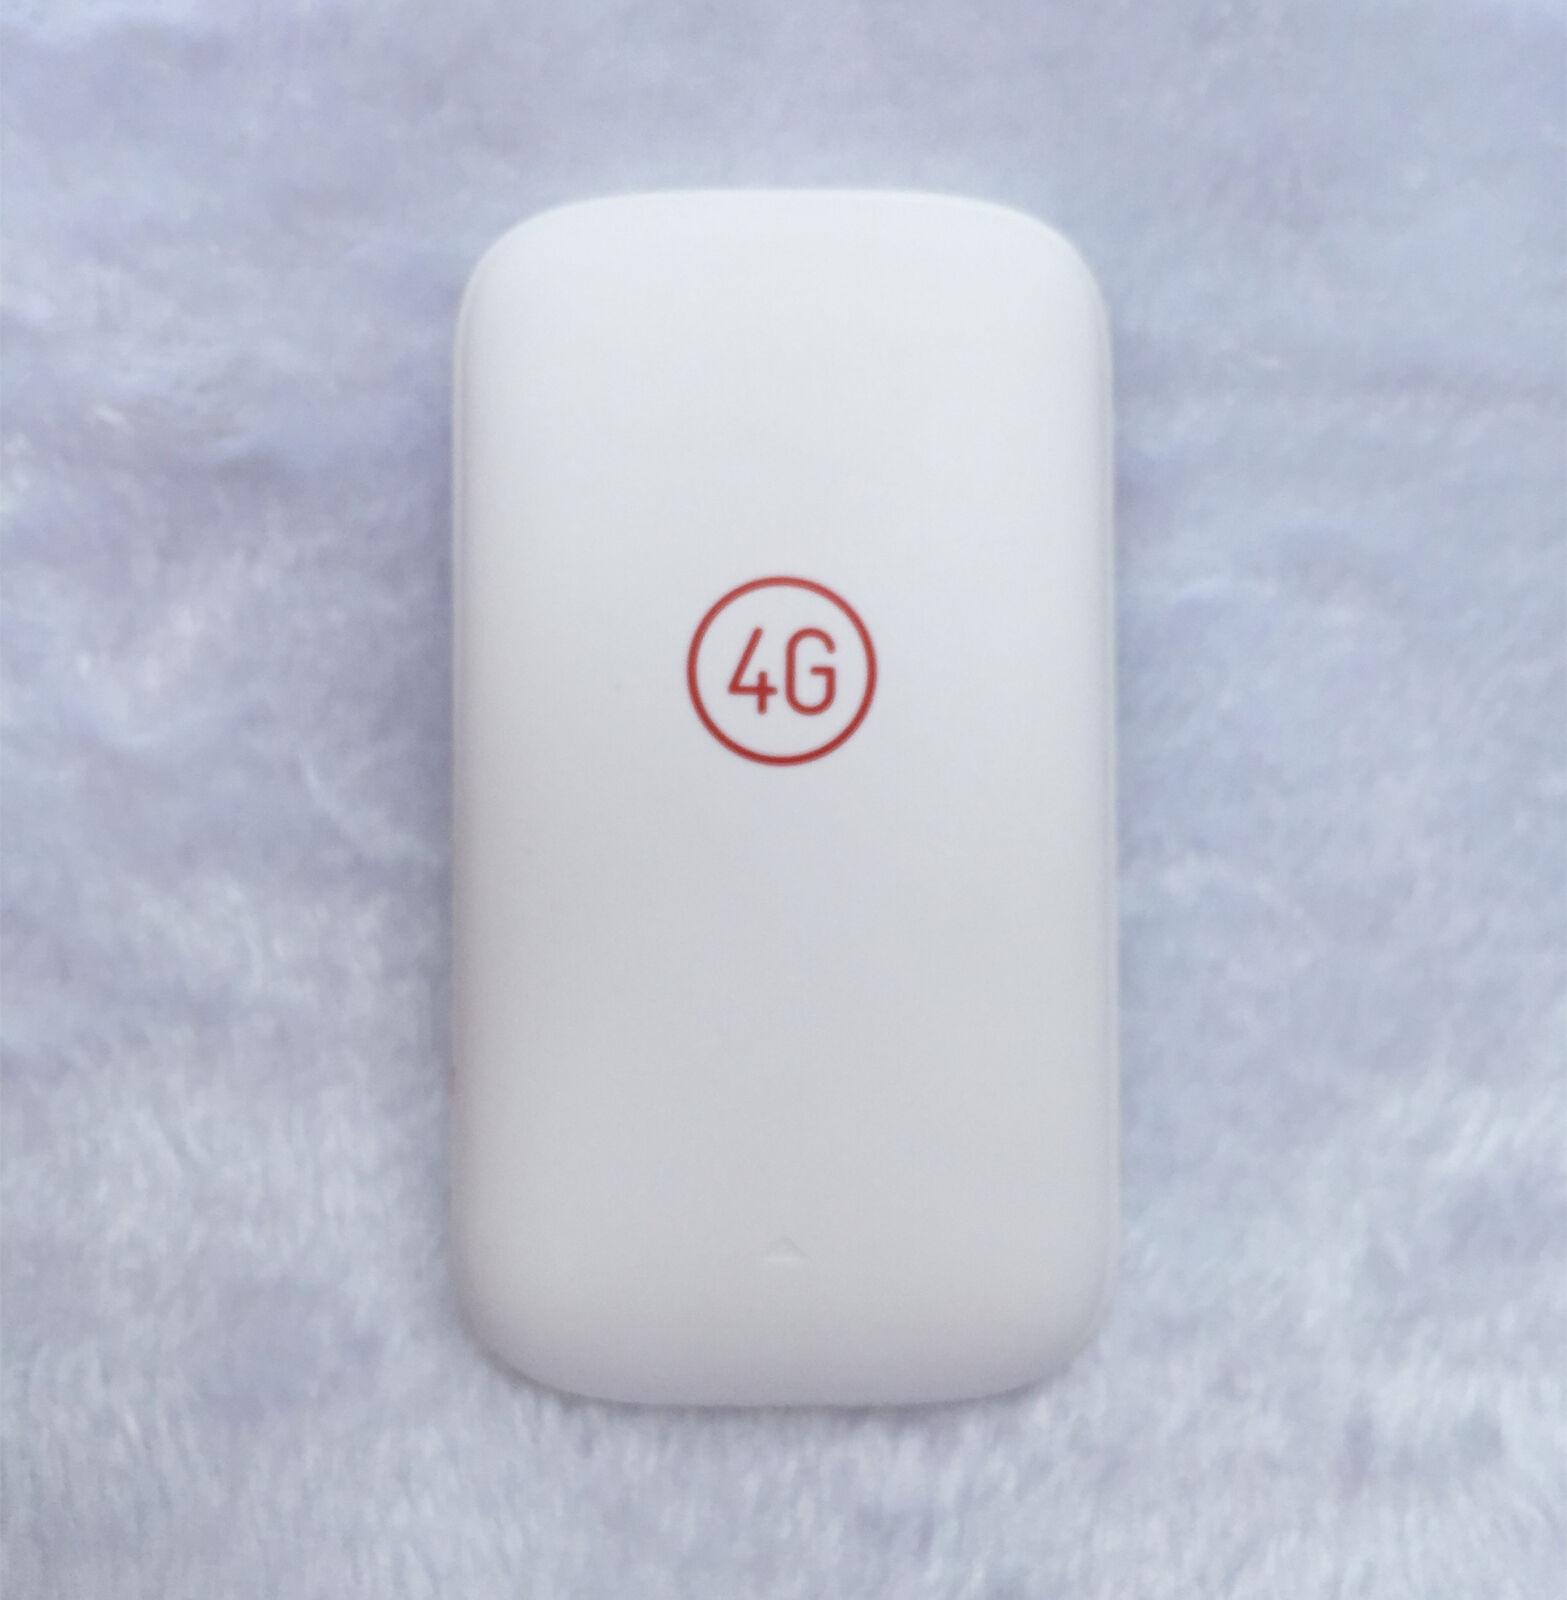 Unlocked Hotspot Zte Mf90 4g Wi Fi Router 100 Mbps Ebay Modem Bolt Unlock Gsm 3g Norton Secured Powered By Verisign